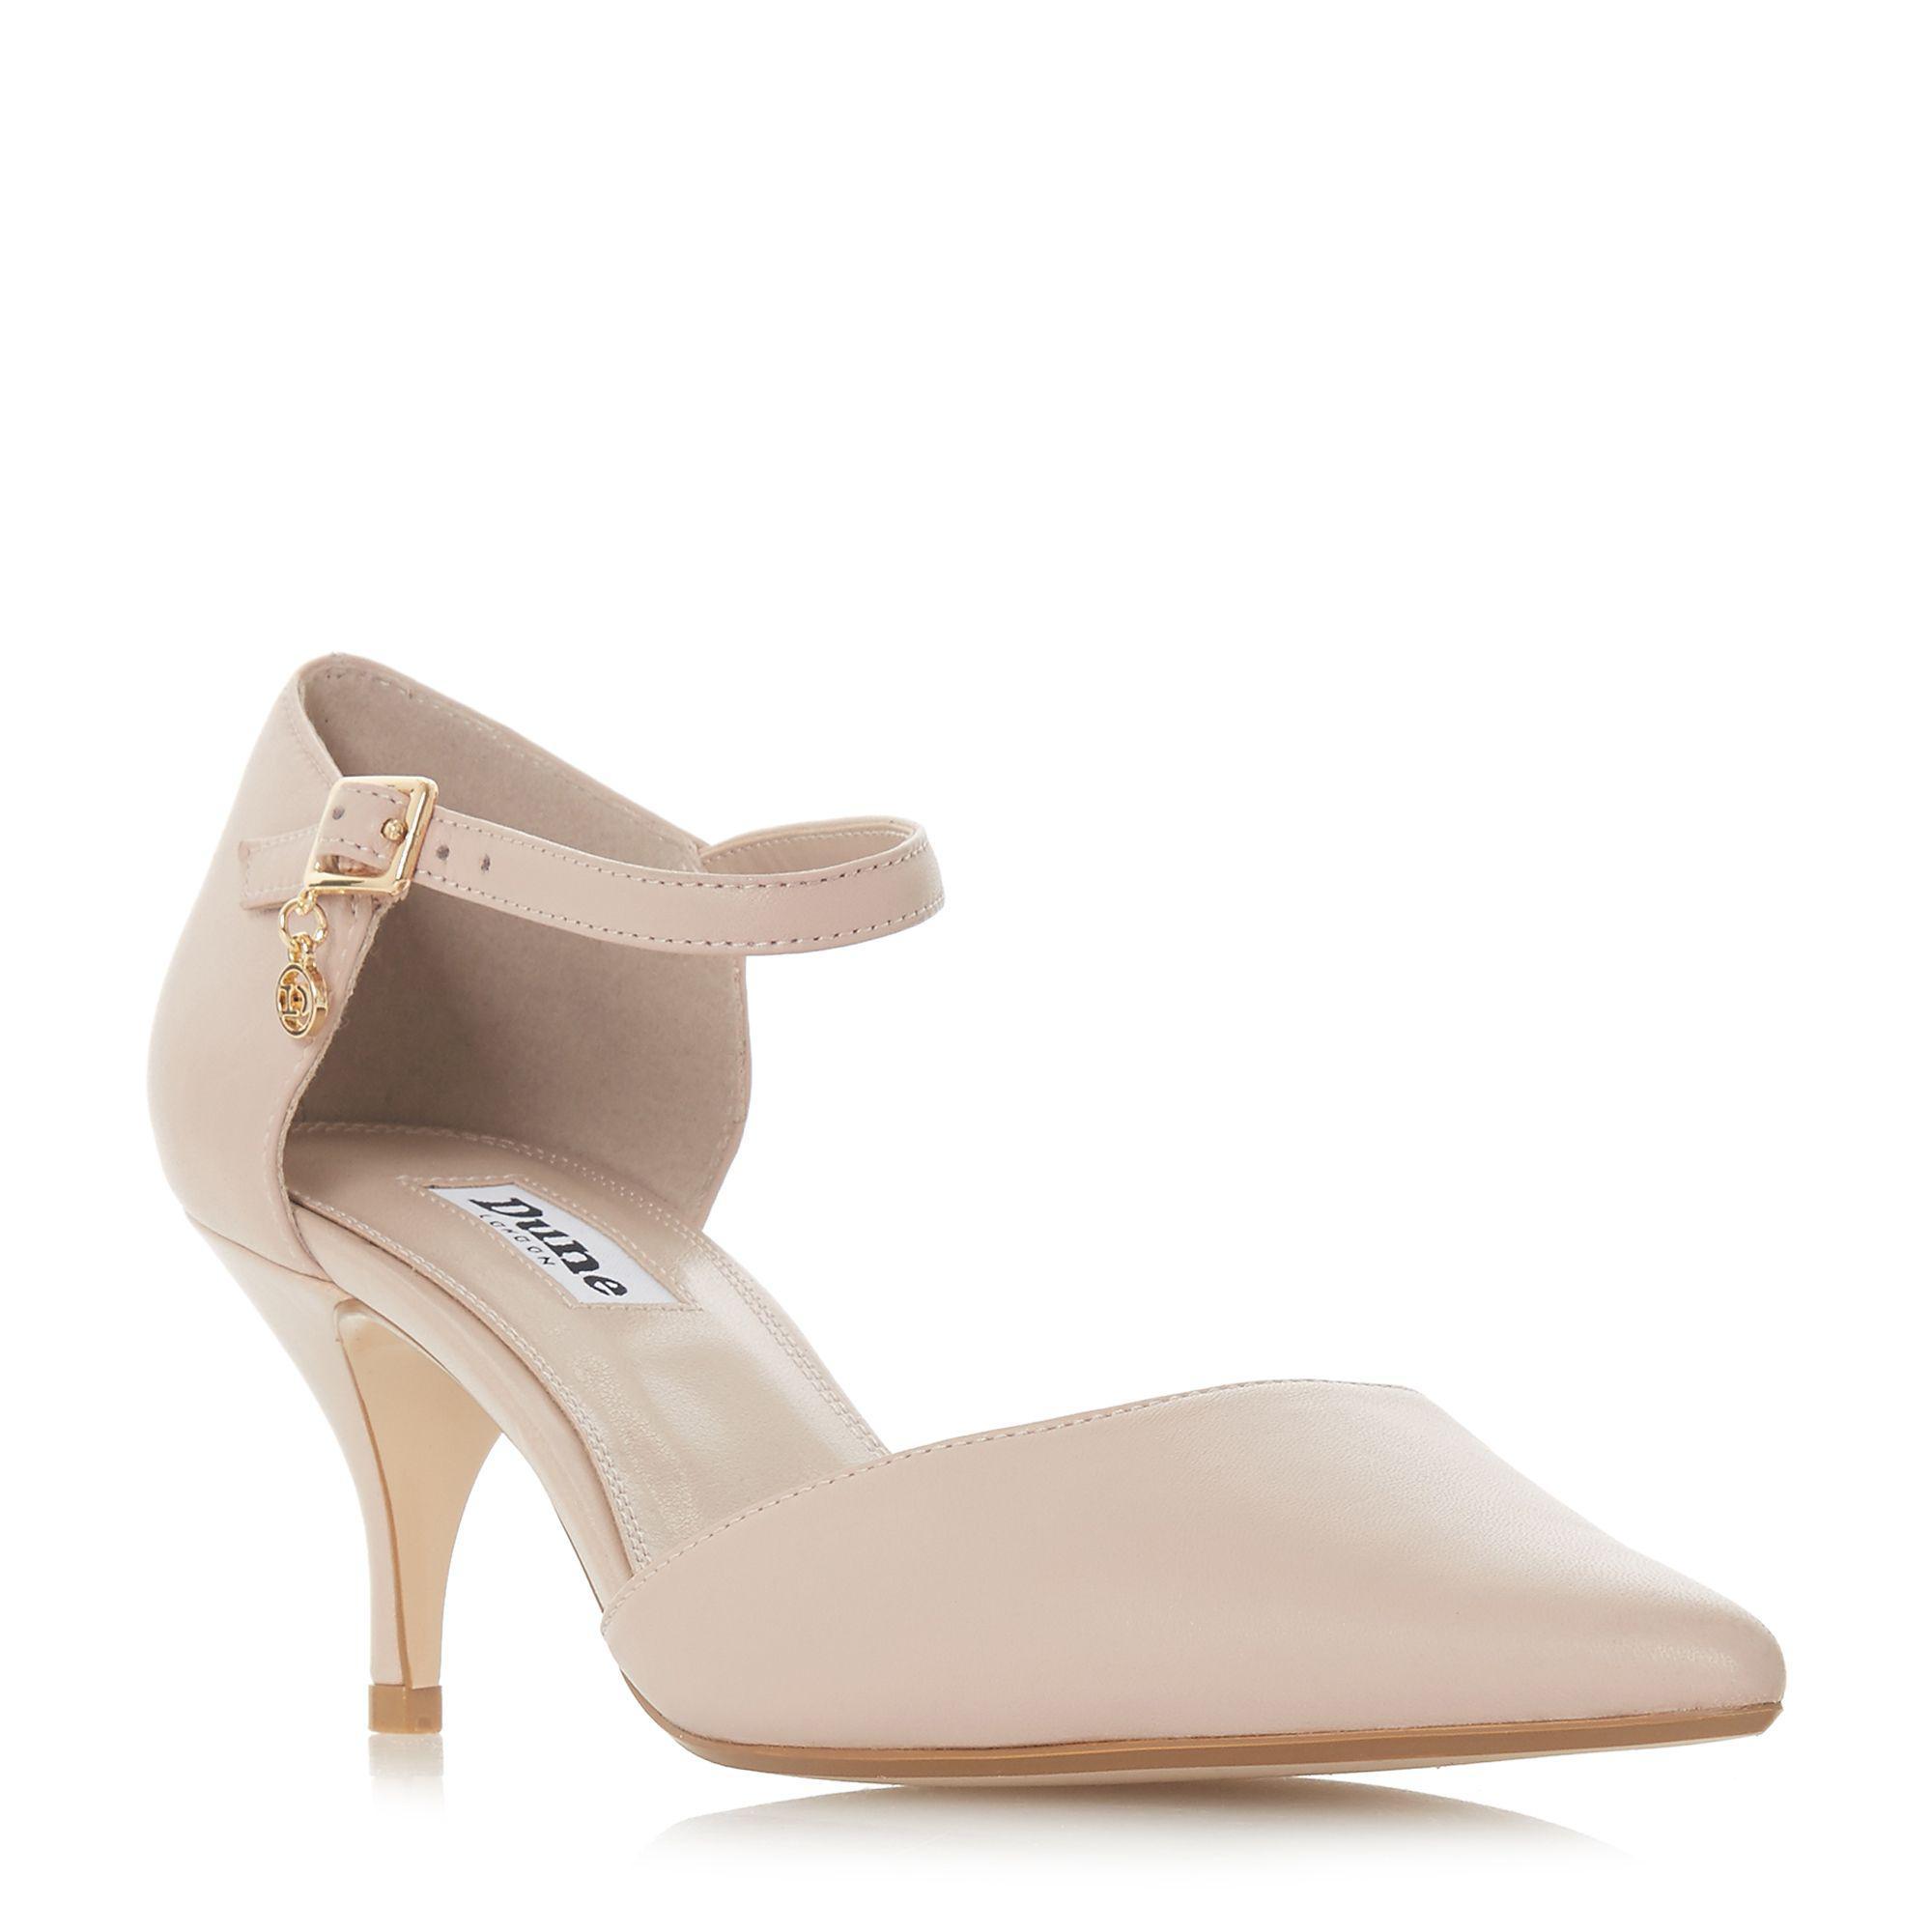 6dc96b949 Dune Light Pink Leather 'celeste T' Mid Kitten Heel Court Shoes in ...